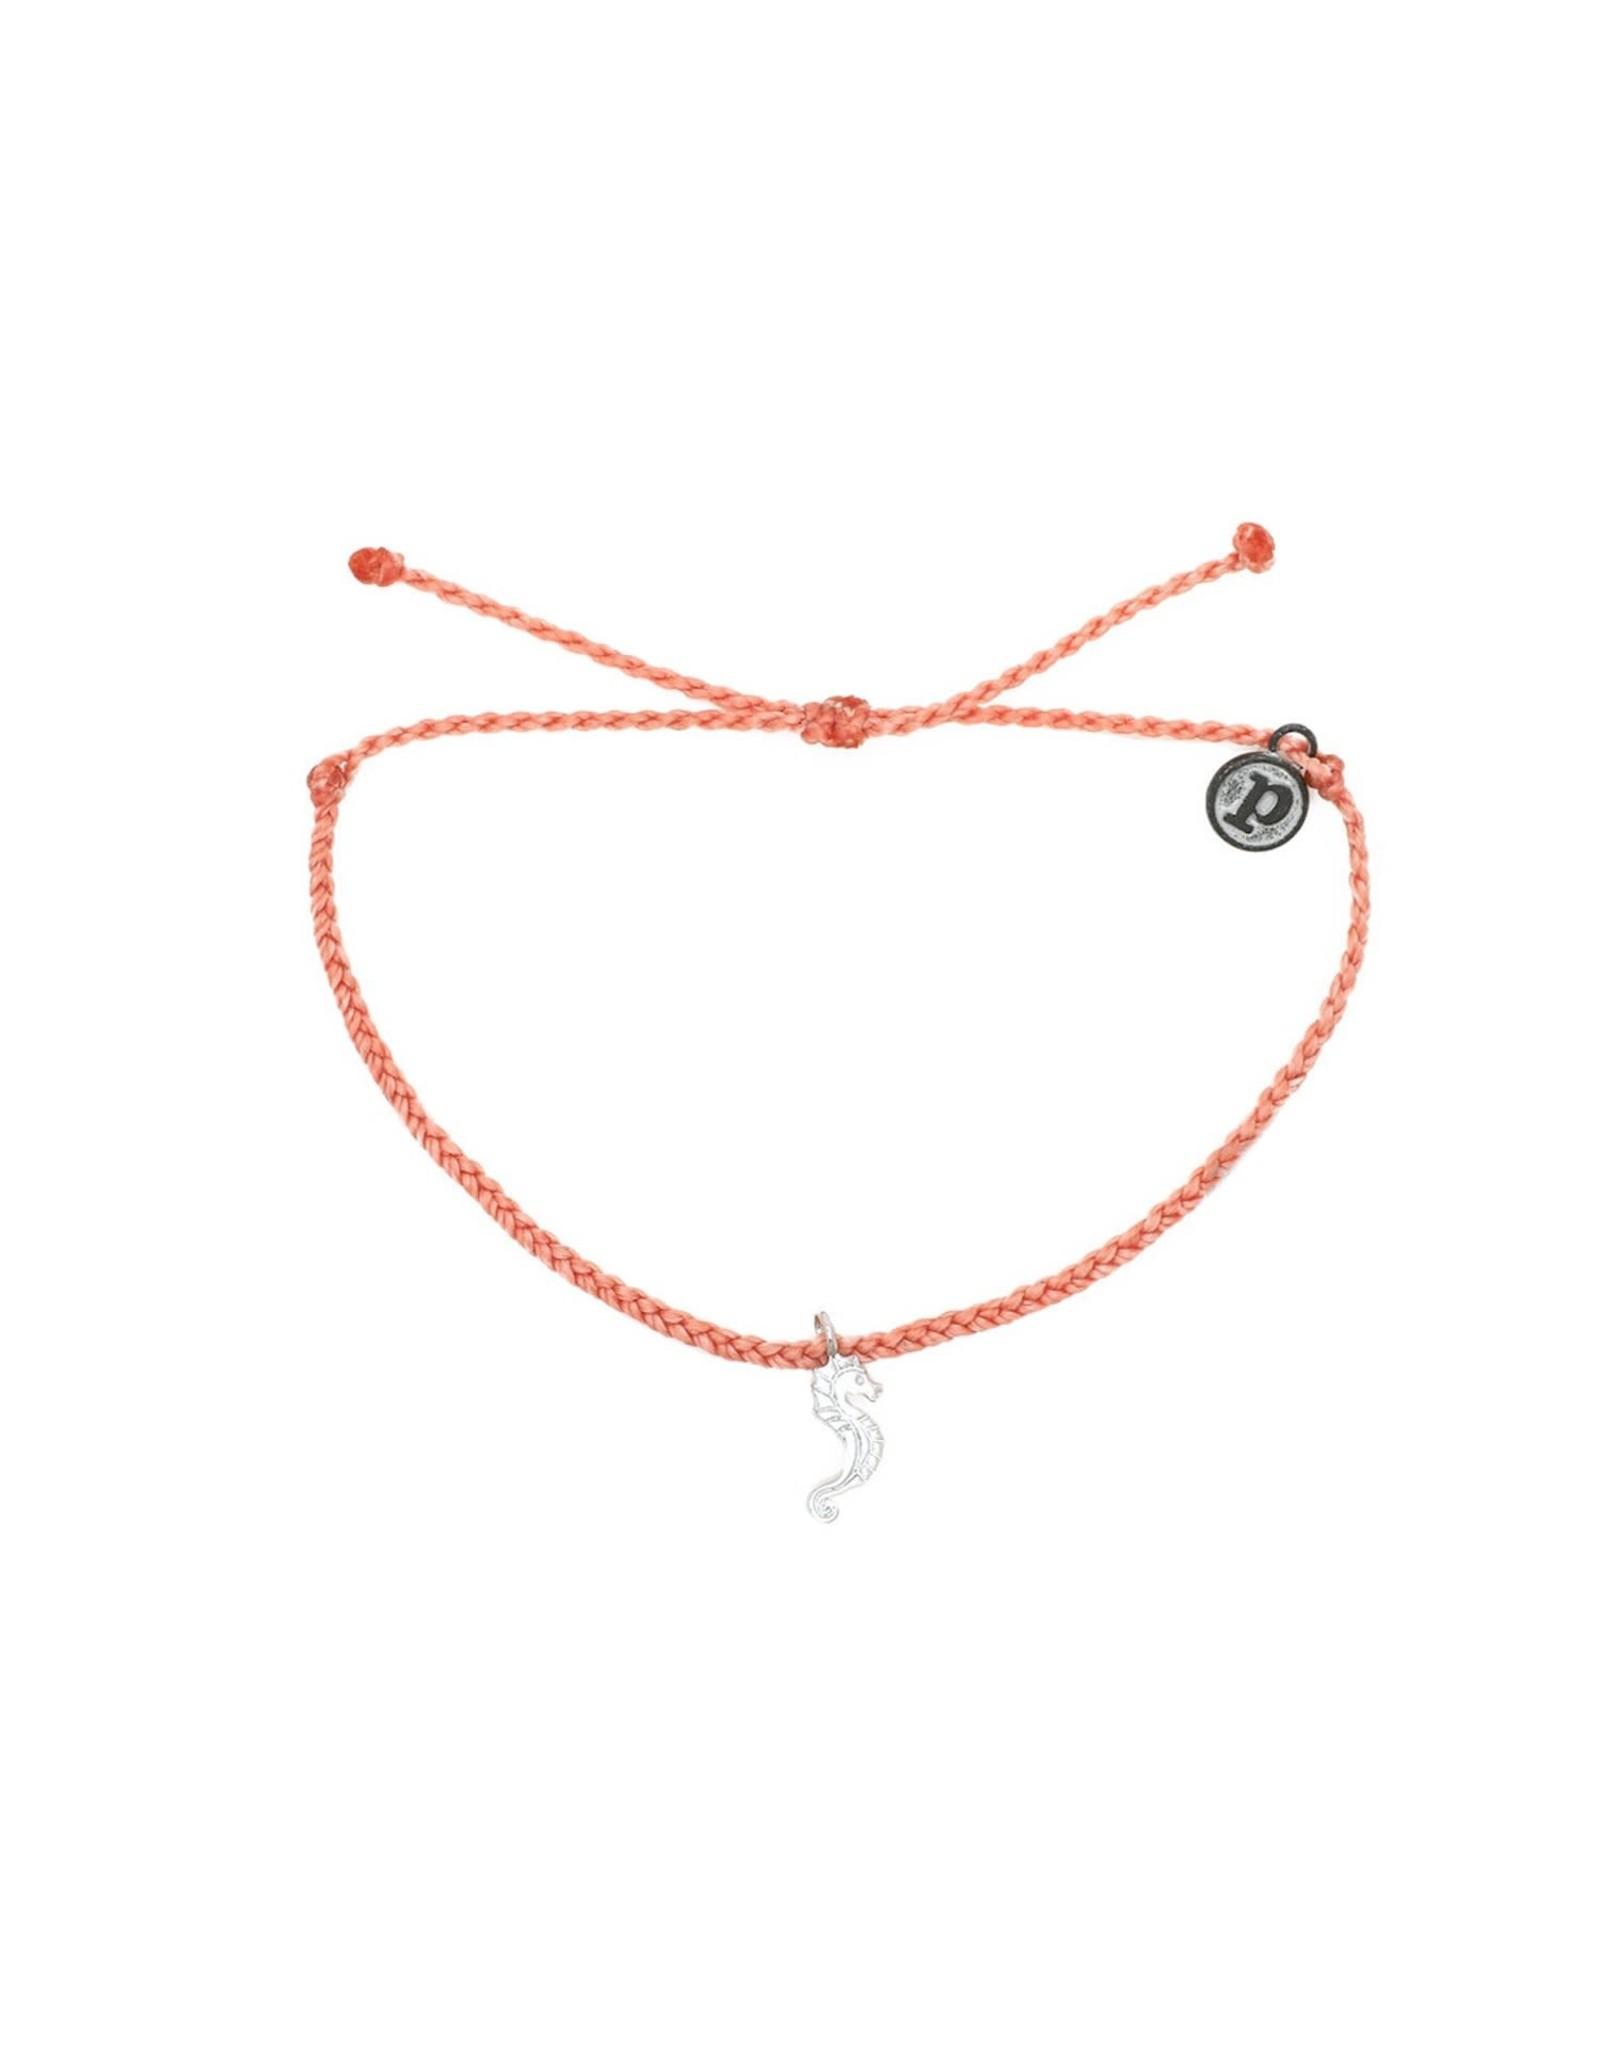 SILVER SEAHORSE Bitty Braid Bracelet,SALMON PINK